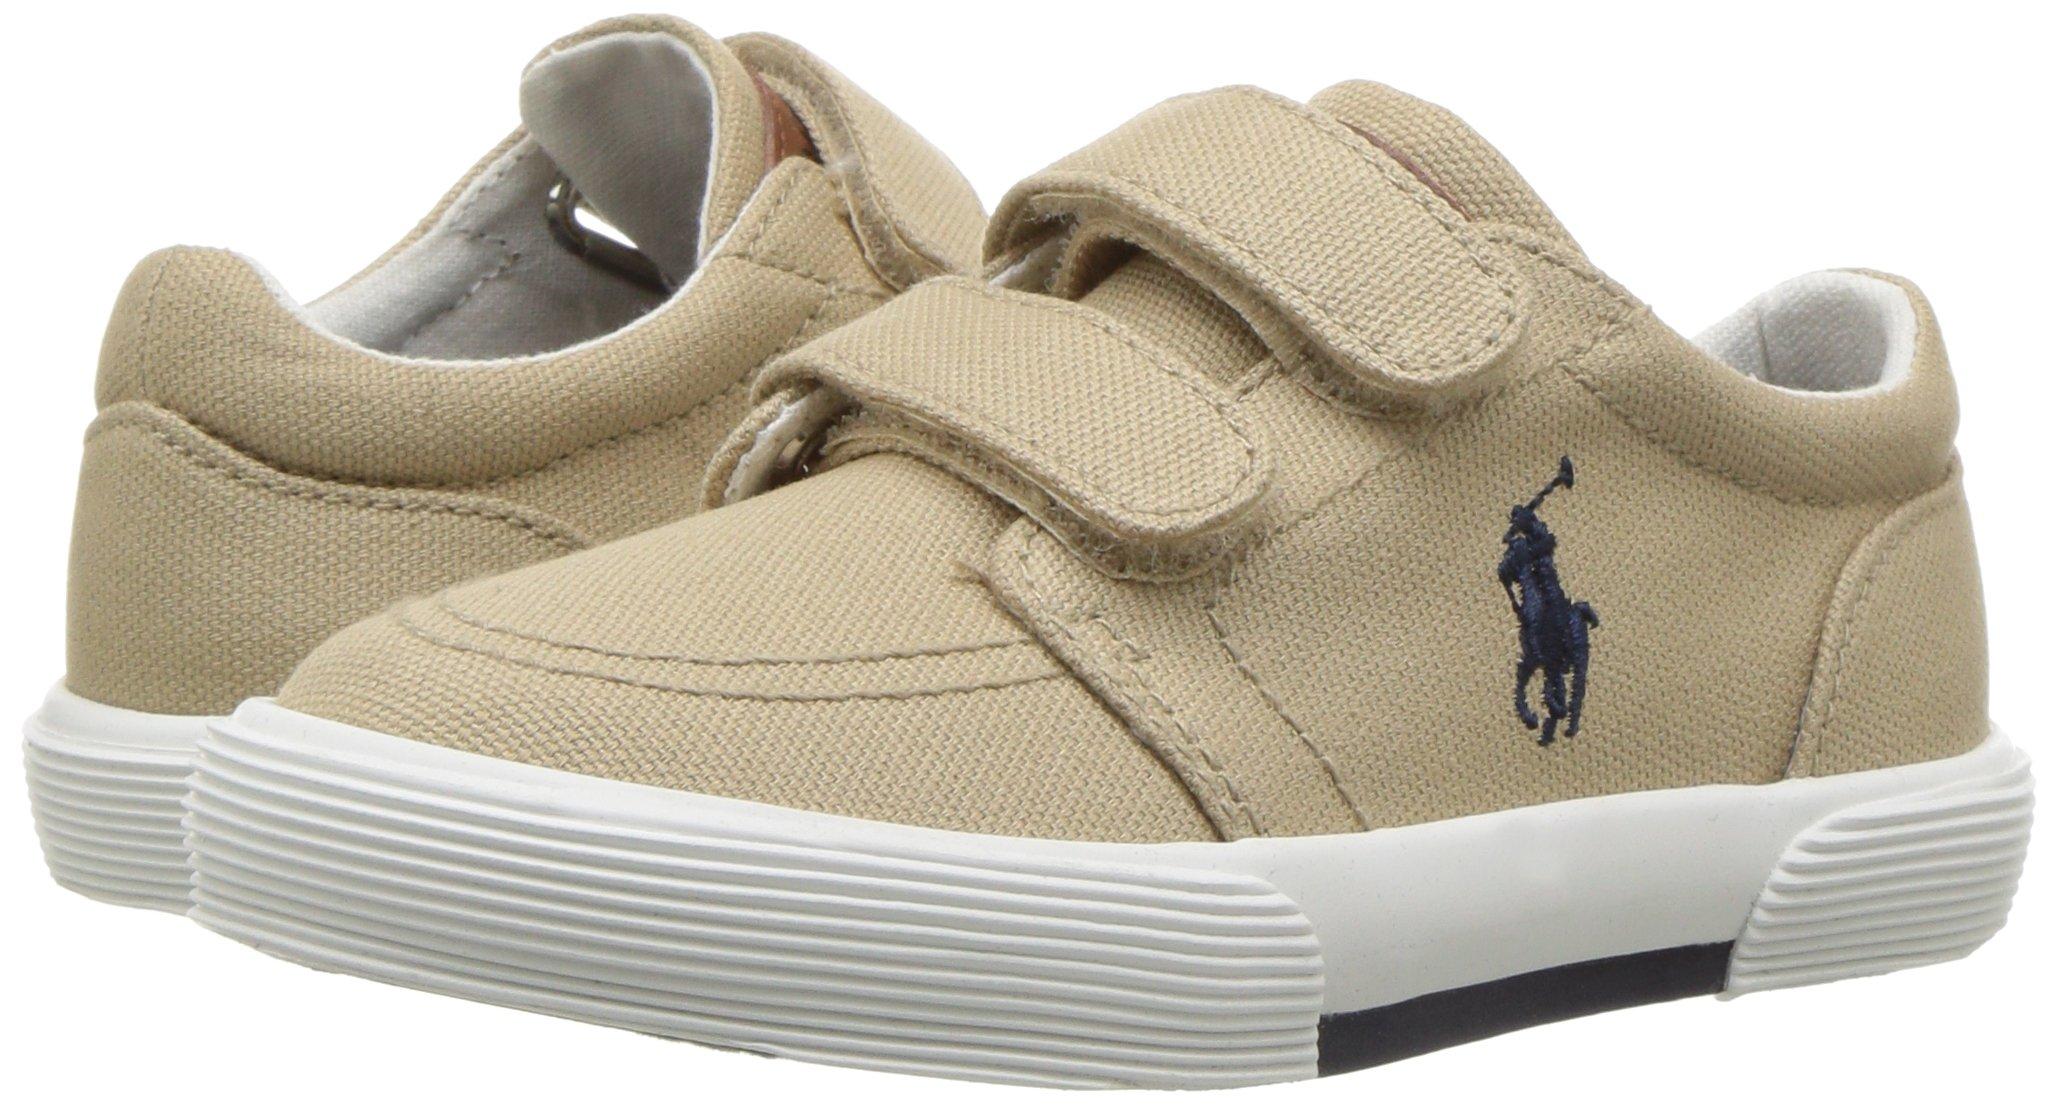 Polo Ralph Lauren Kids Boys' Faxon II Sneaker, Khaki Cotton, 10 M US Toddler by Polo Ralph Lauren (Image #6)